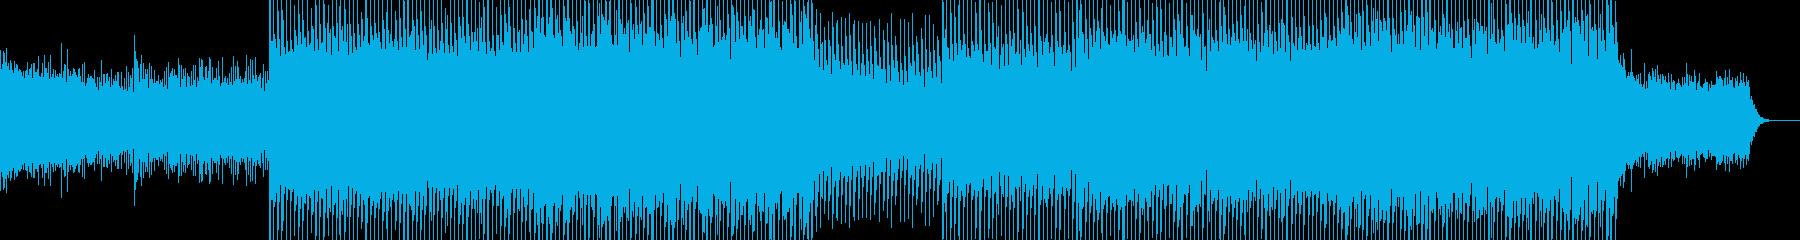 EDMポップで明るいクラブ系-34の再生済みの波形